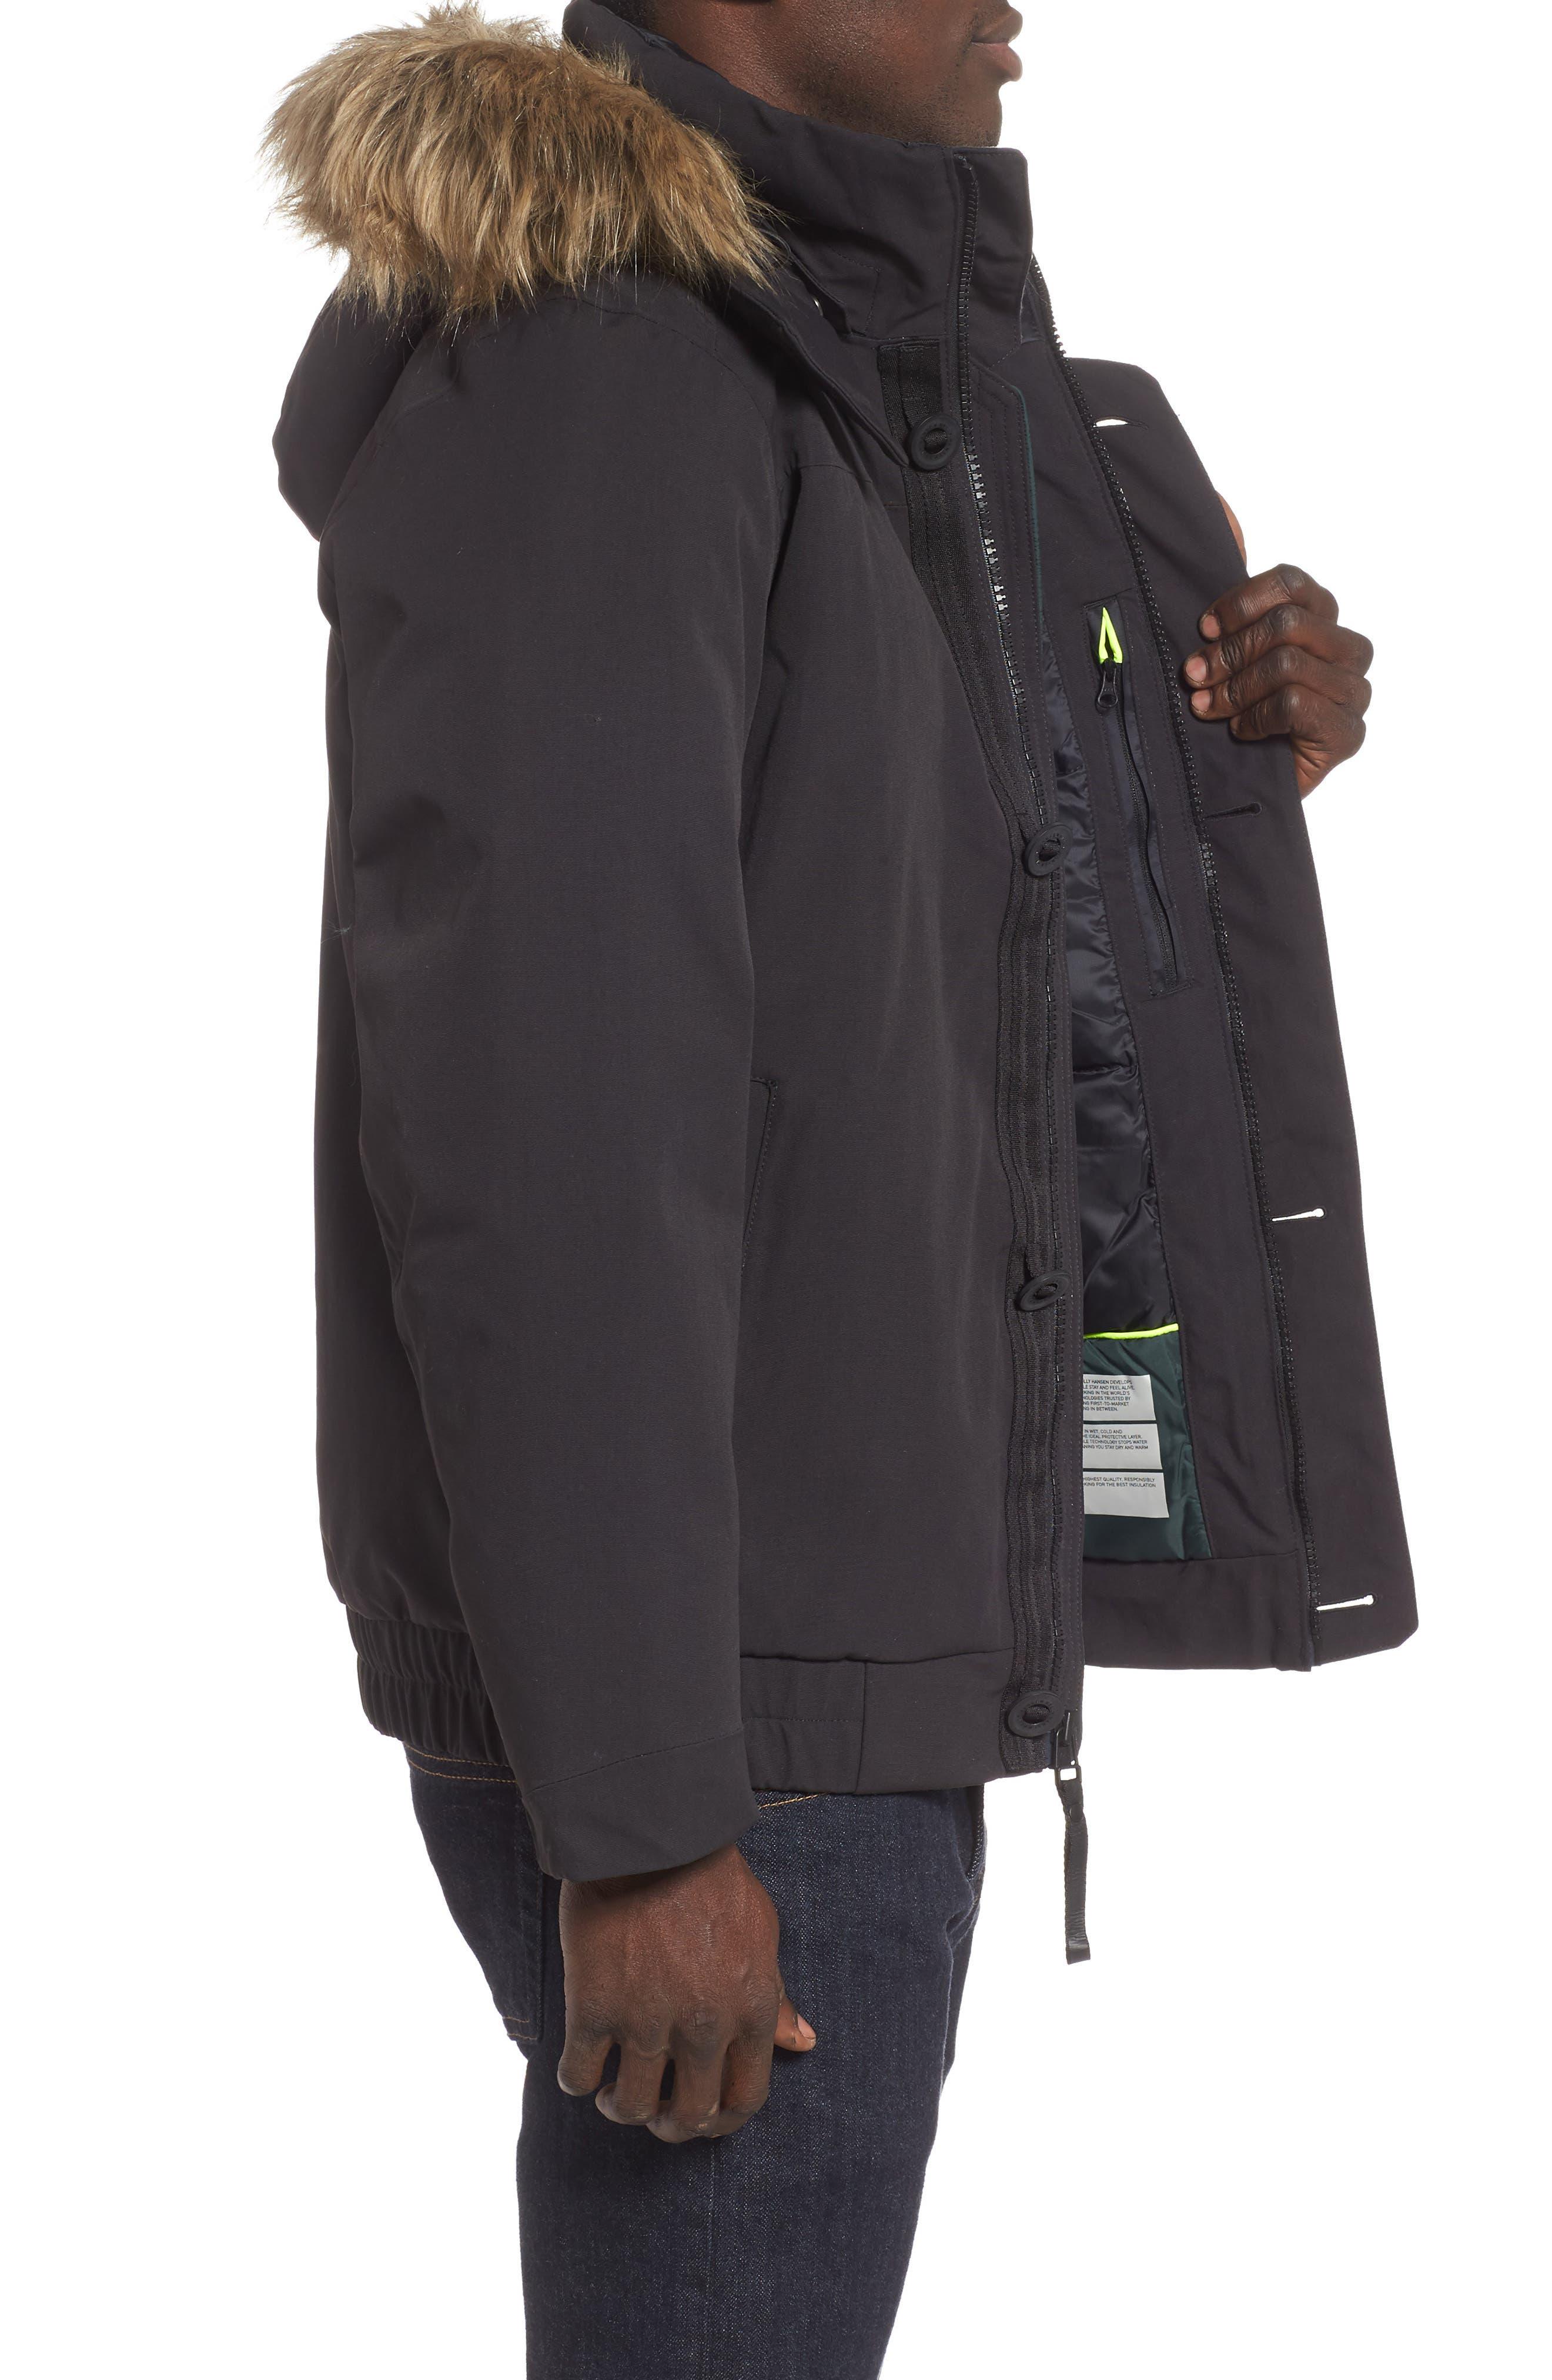 Bardu Waterproof Bomber Jacket with Detachable Hood and Faux Fur Trim,                             Alternate thumbnail 3, color,                             BLACK